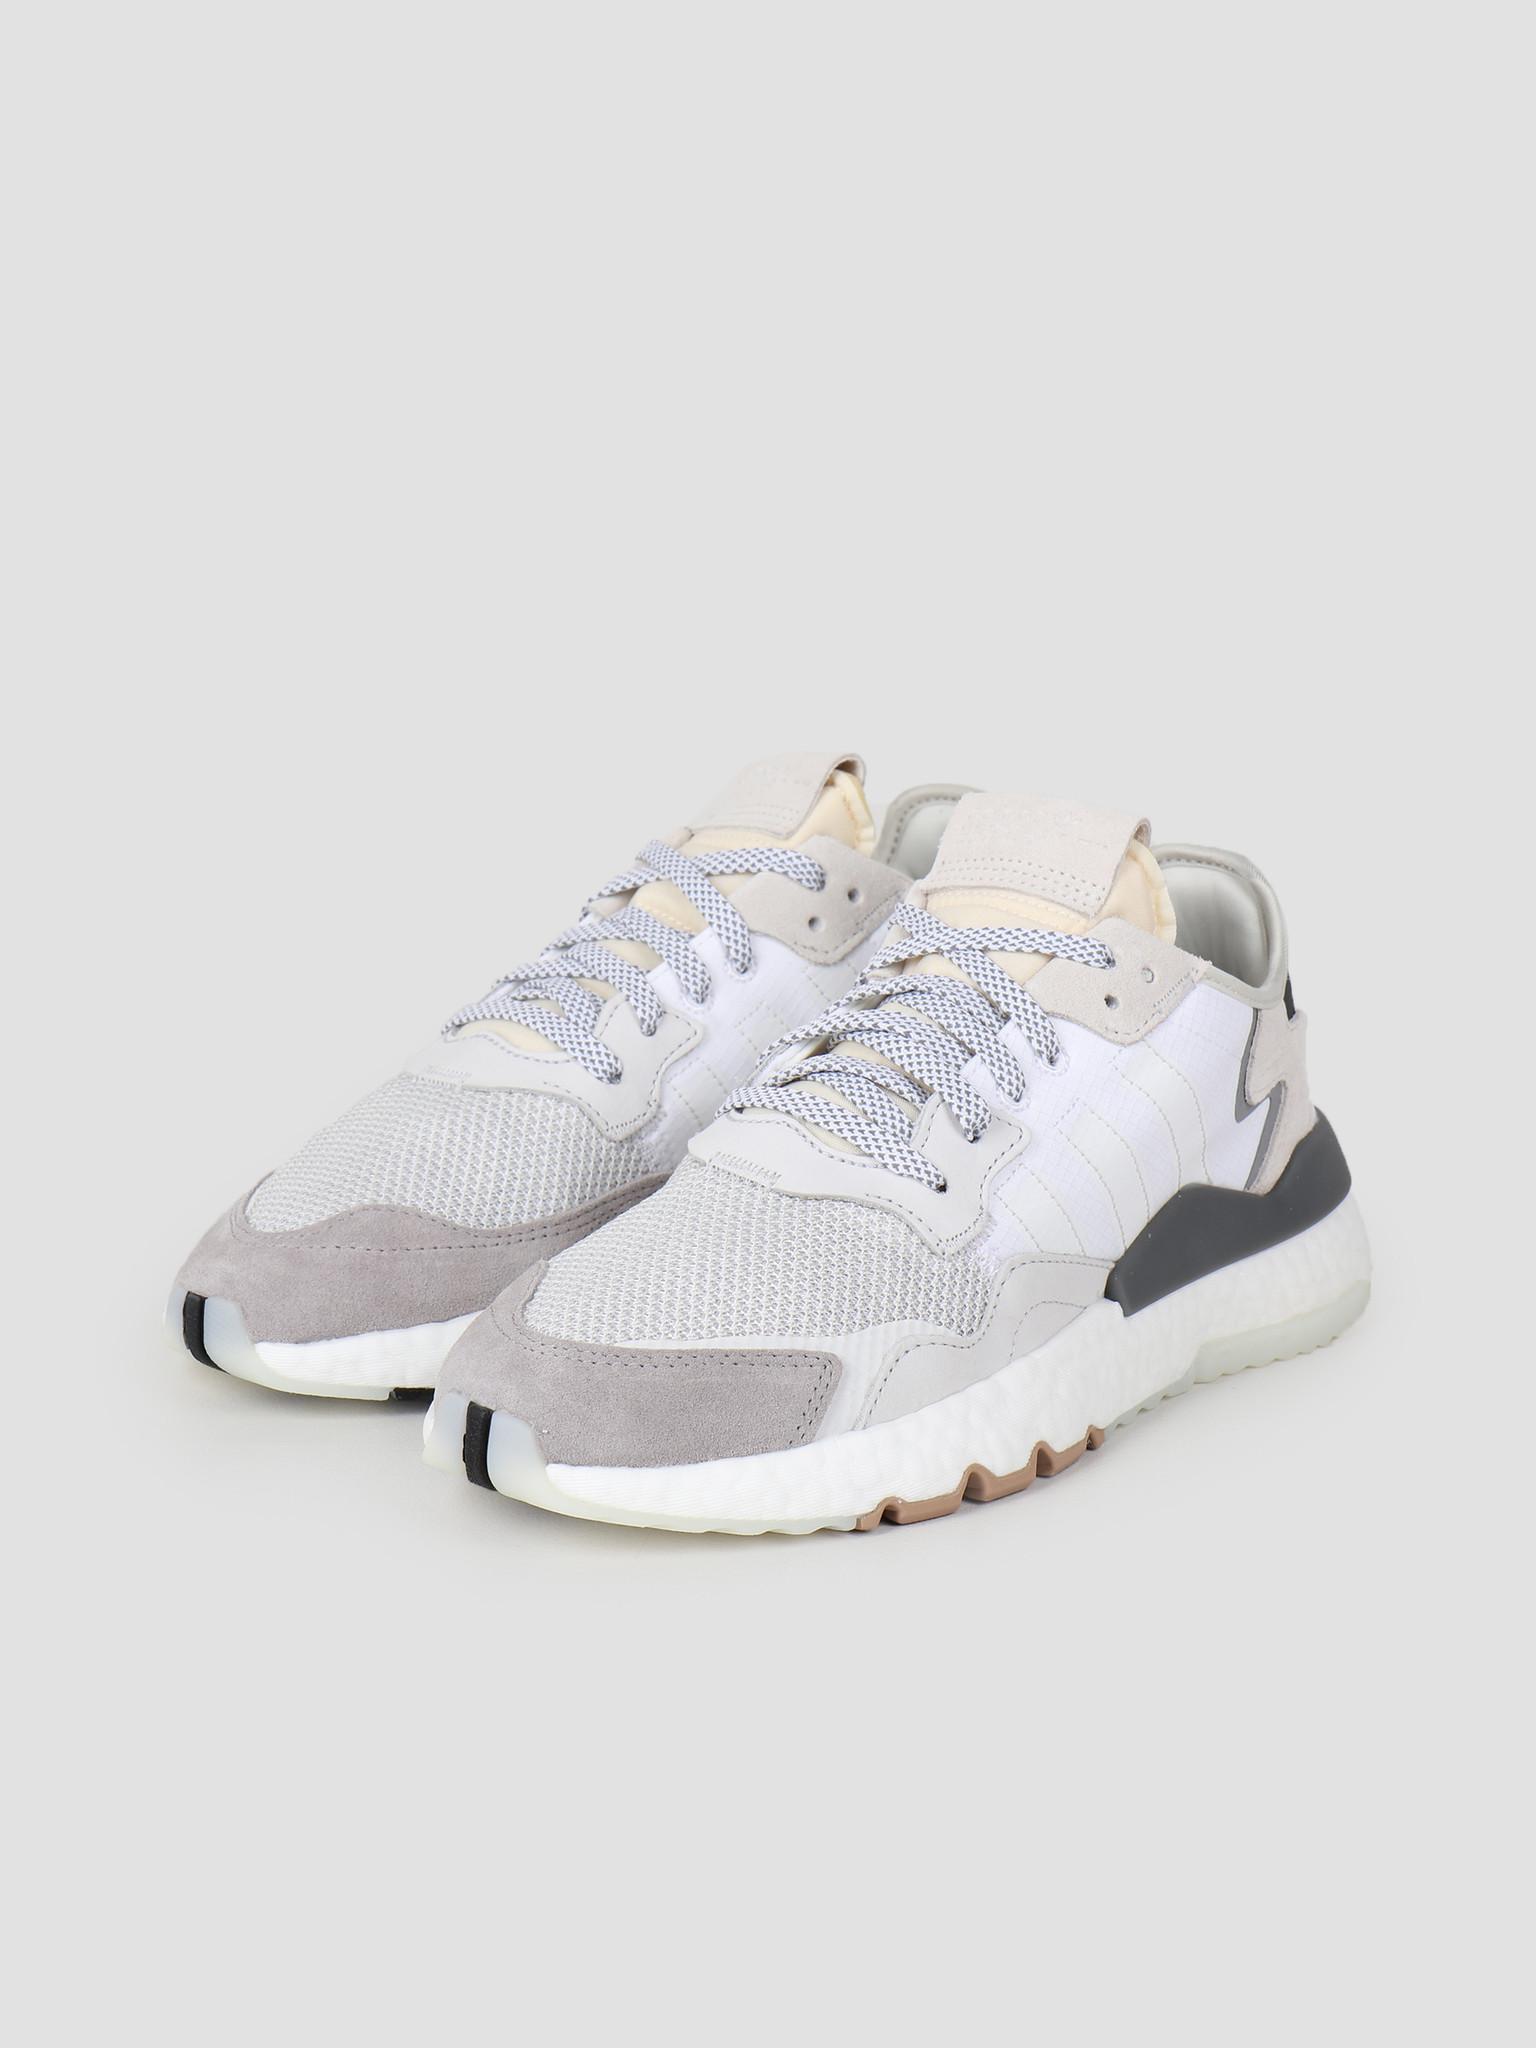 adidas adidas Nite Jogger Ftwwht Crywht Cblack CG5950